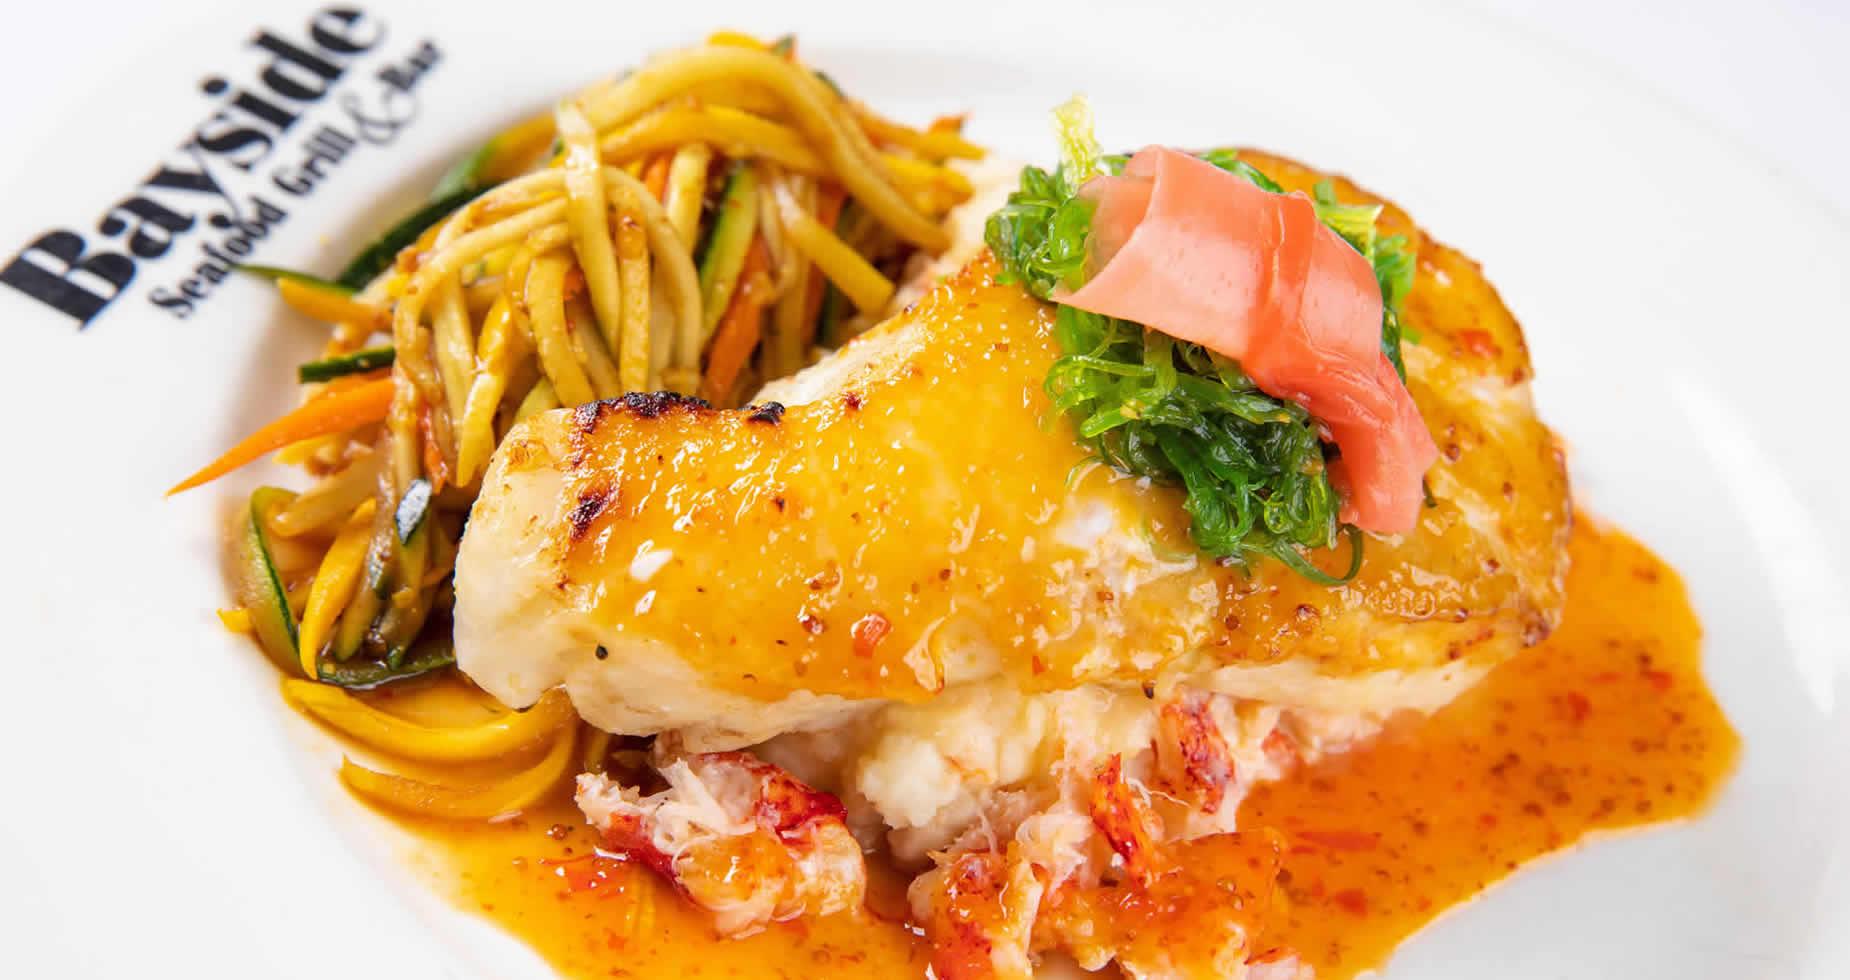 Seafood Entree at Bayside